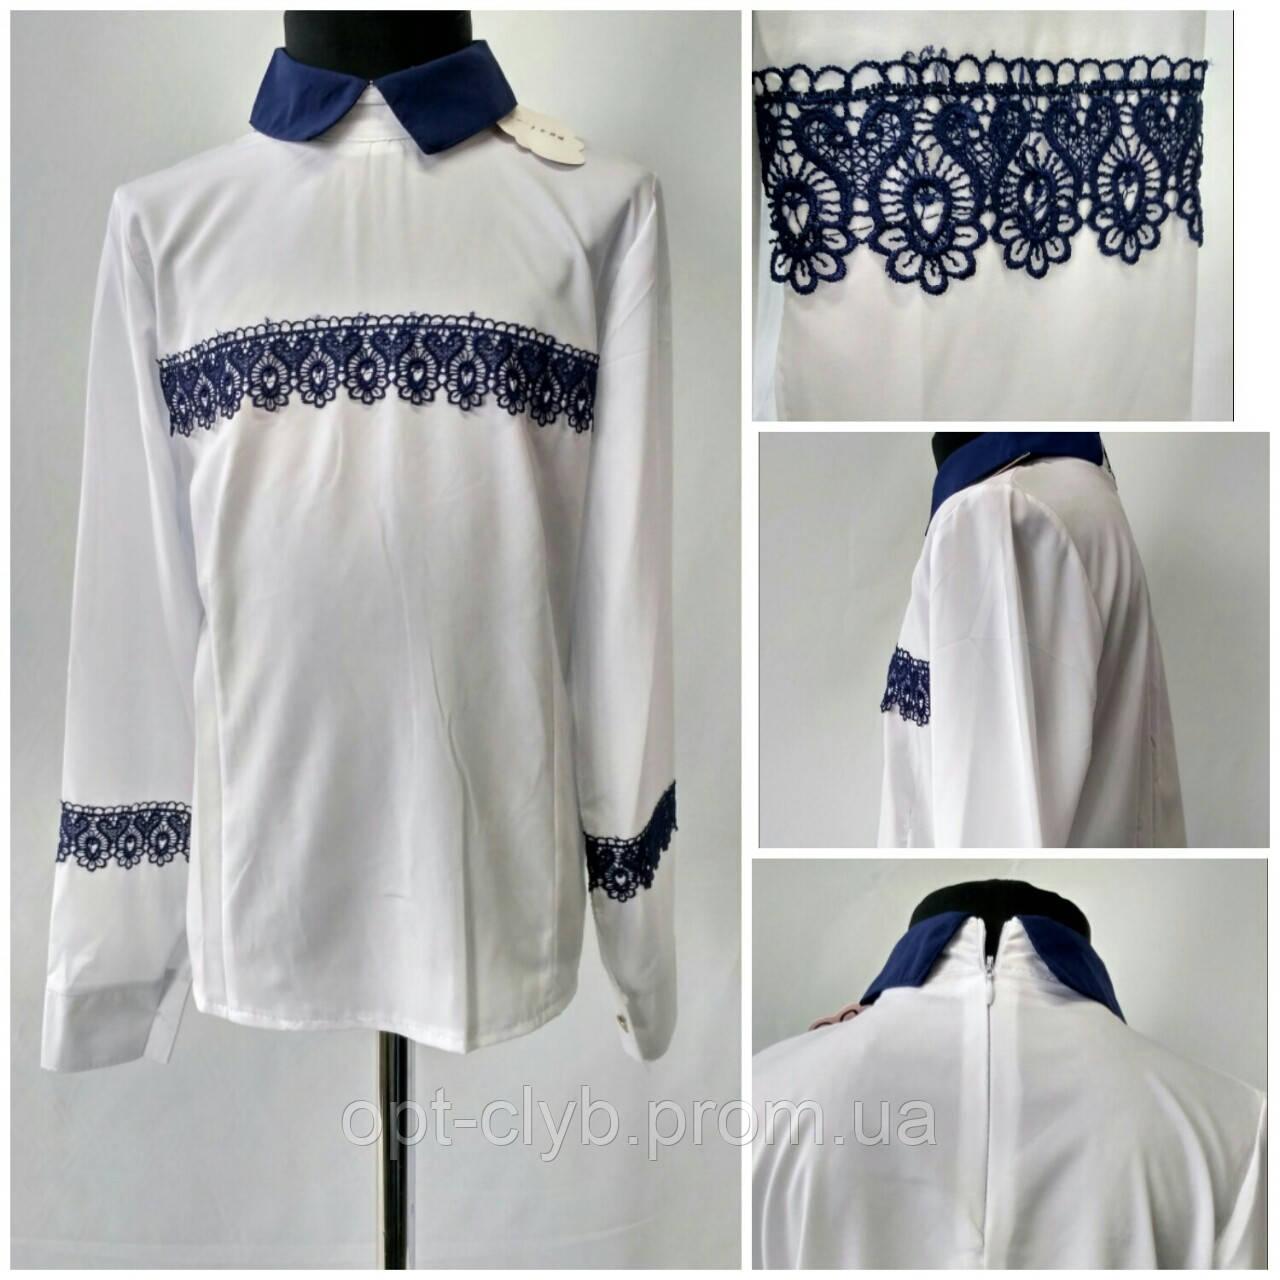 f2fd054b7fc Нарядная блузка